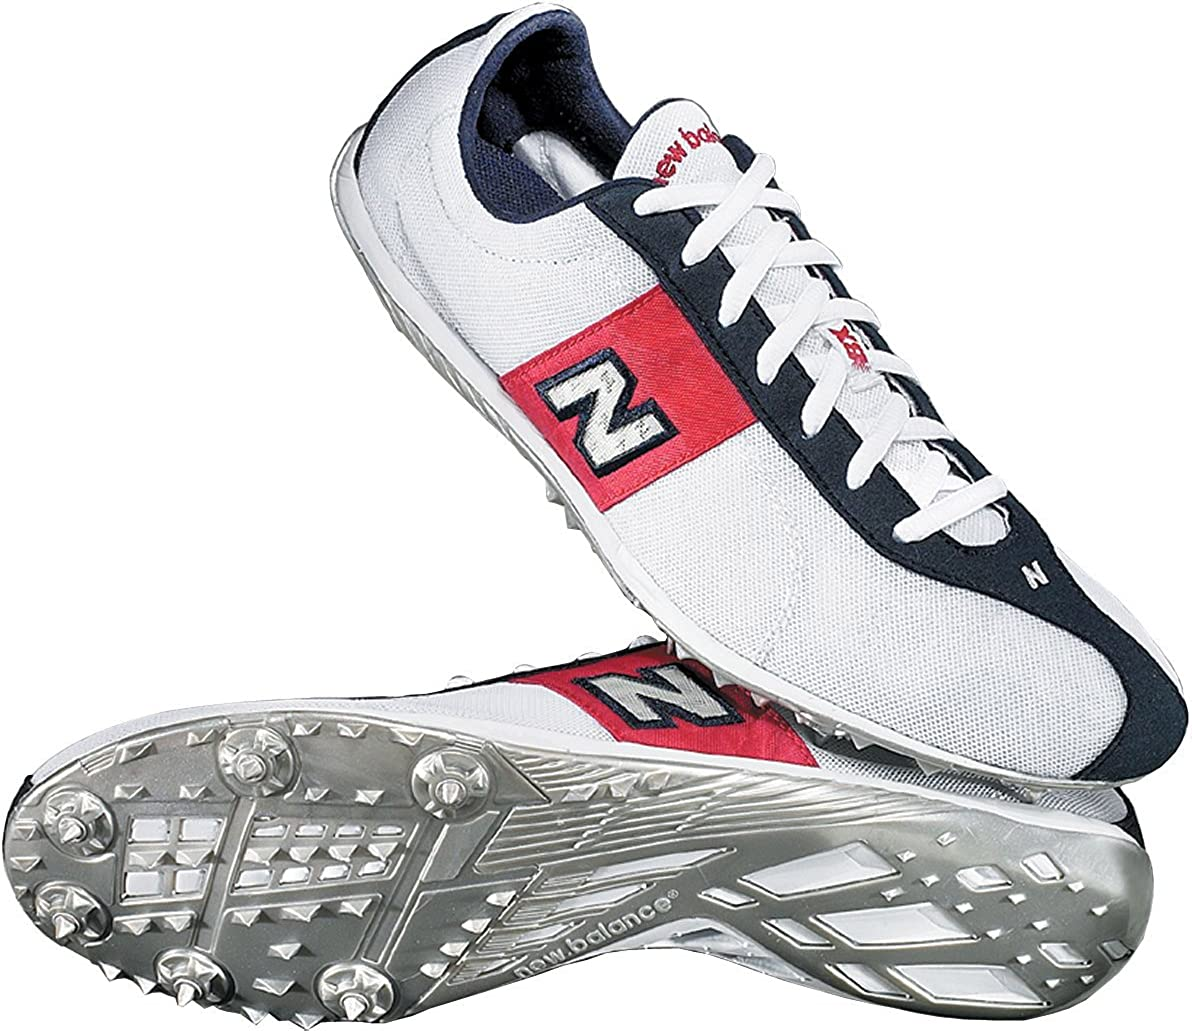 New Balance LDS1000 Long Distance Spike Racing Shoe